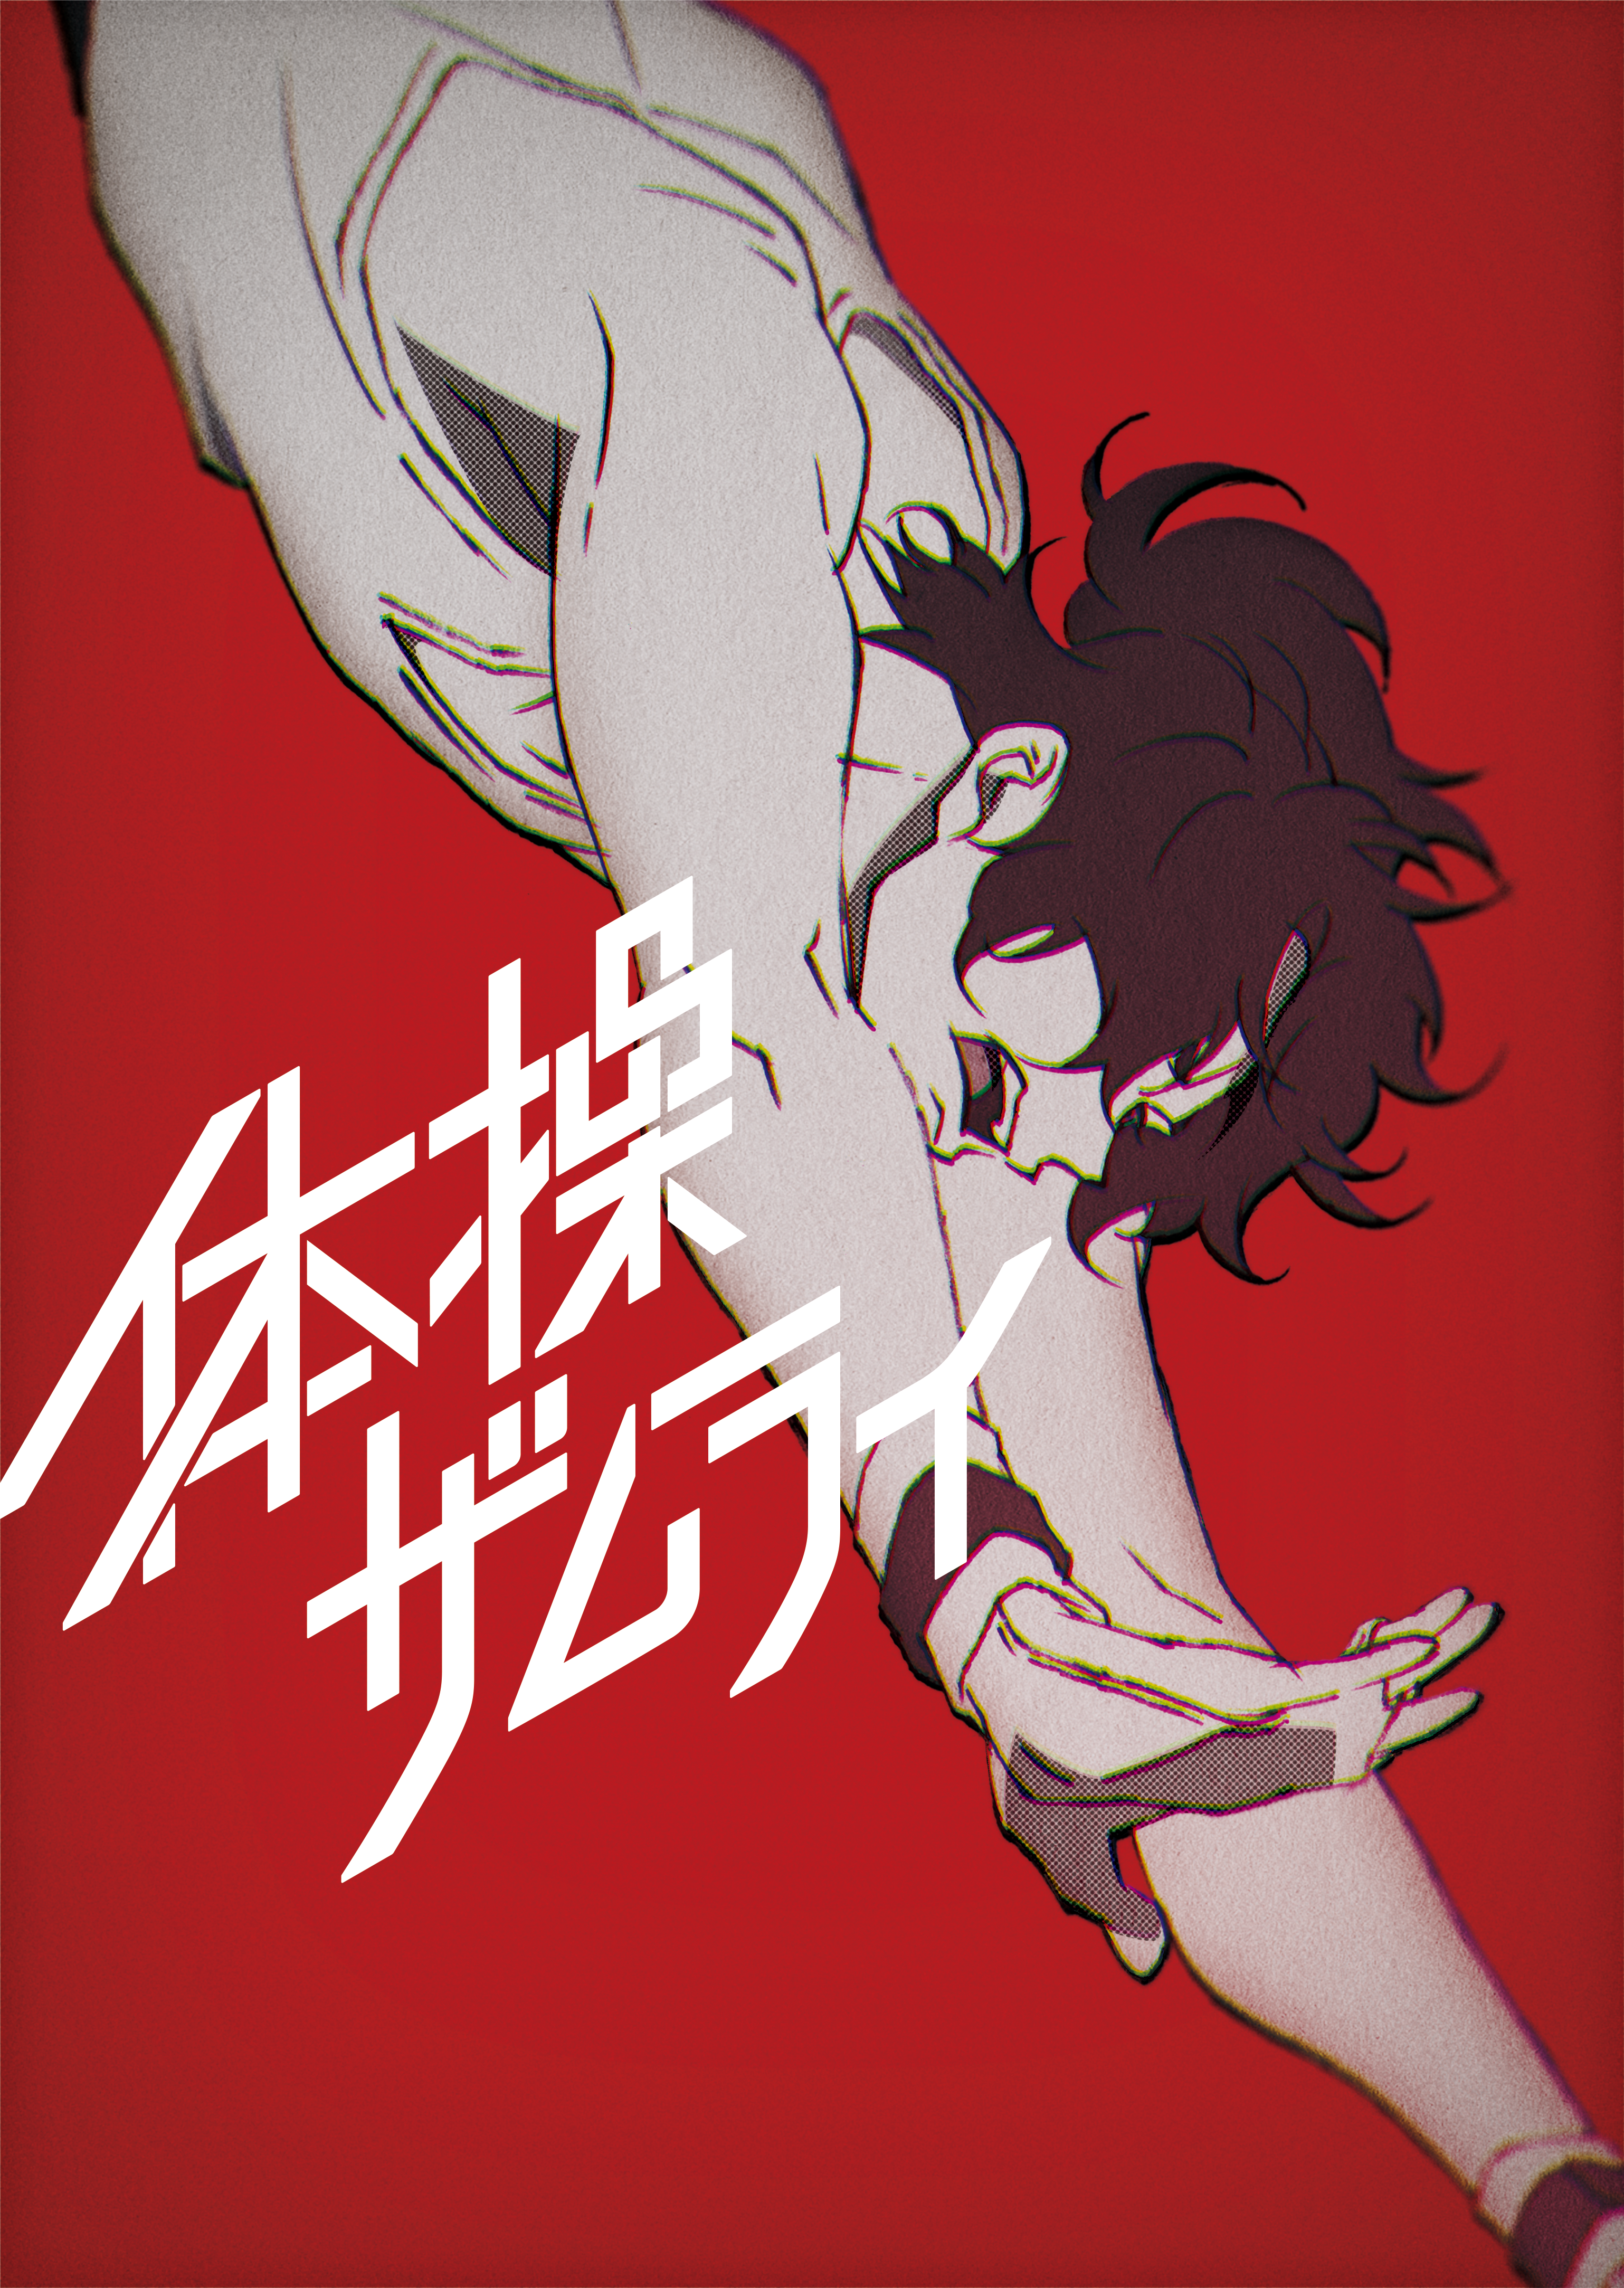 MAPPAの新作オリジナルアニメ「体操ザムライ」10月より放送決定!メインキャストやPVなど一挙情報解禁